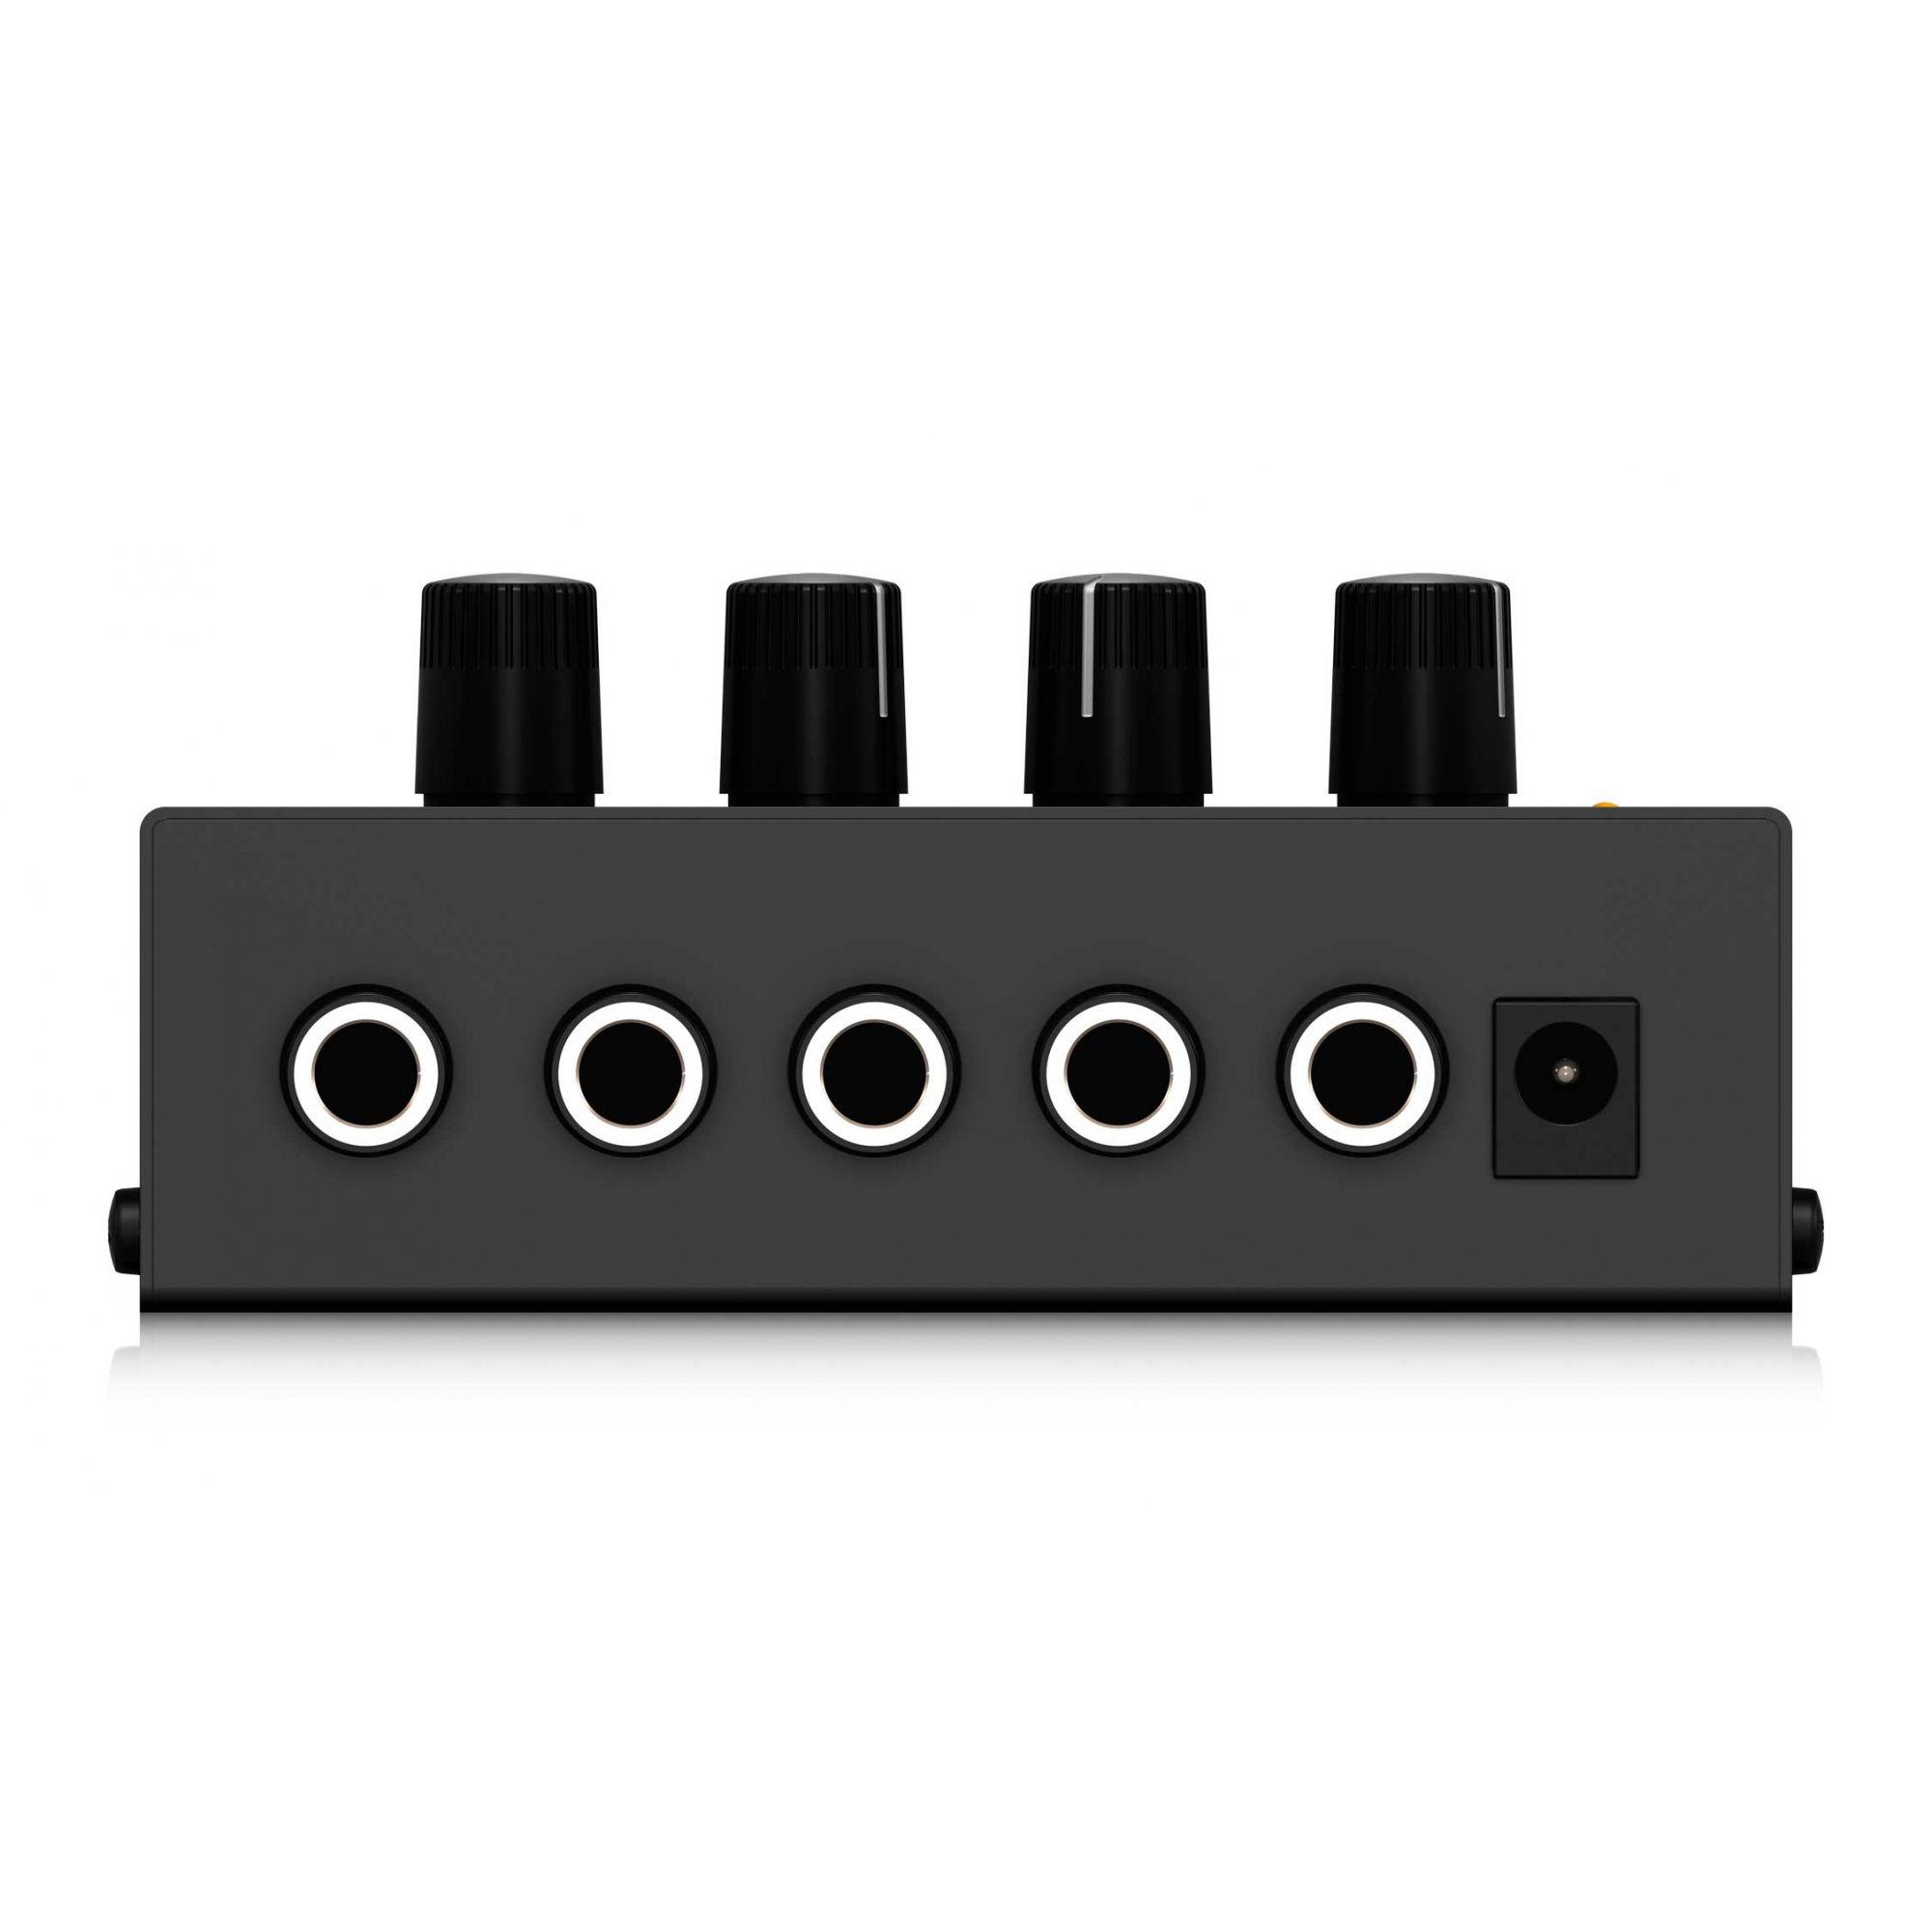 Mixer de 4 canais com 4 entrada e 1 saída   Conexão P10 mono TS   Fonte Bivolt   Behringer   MX400